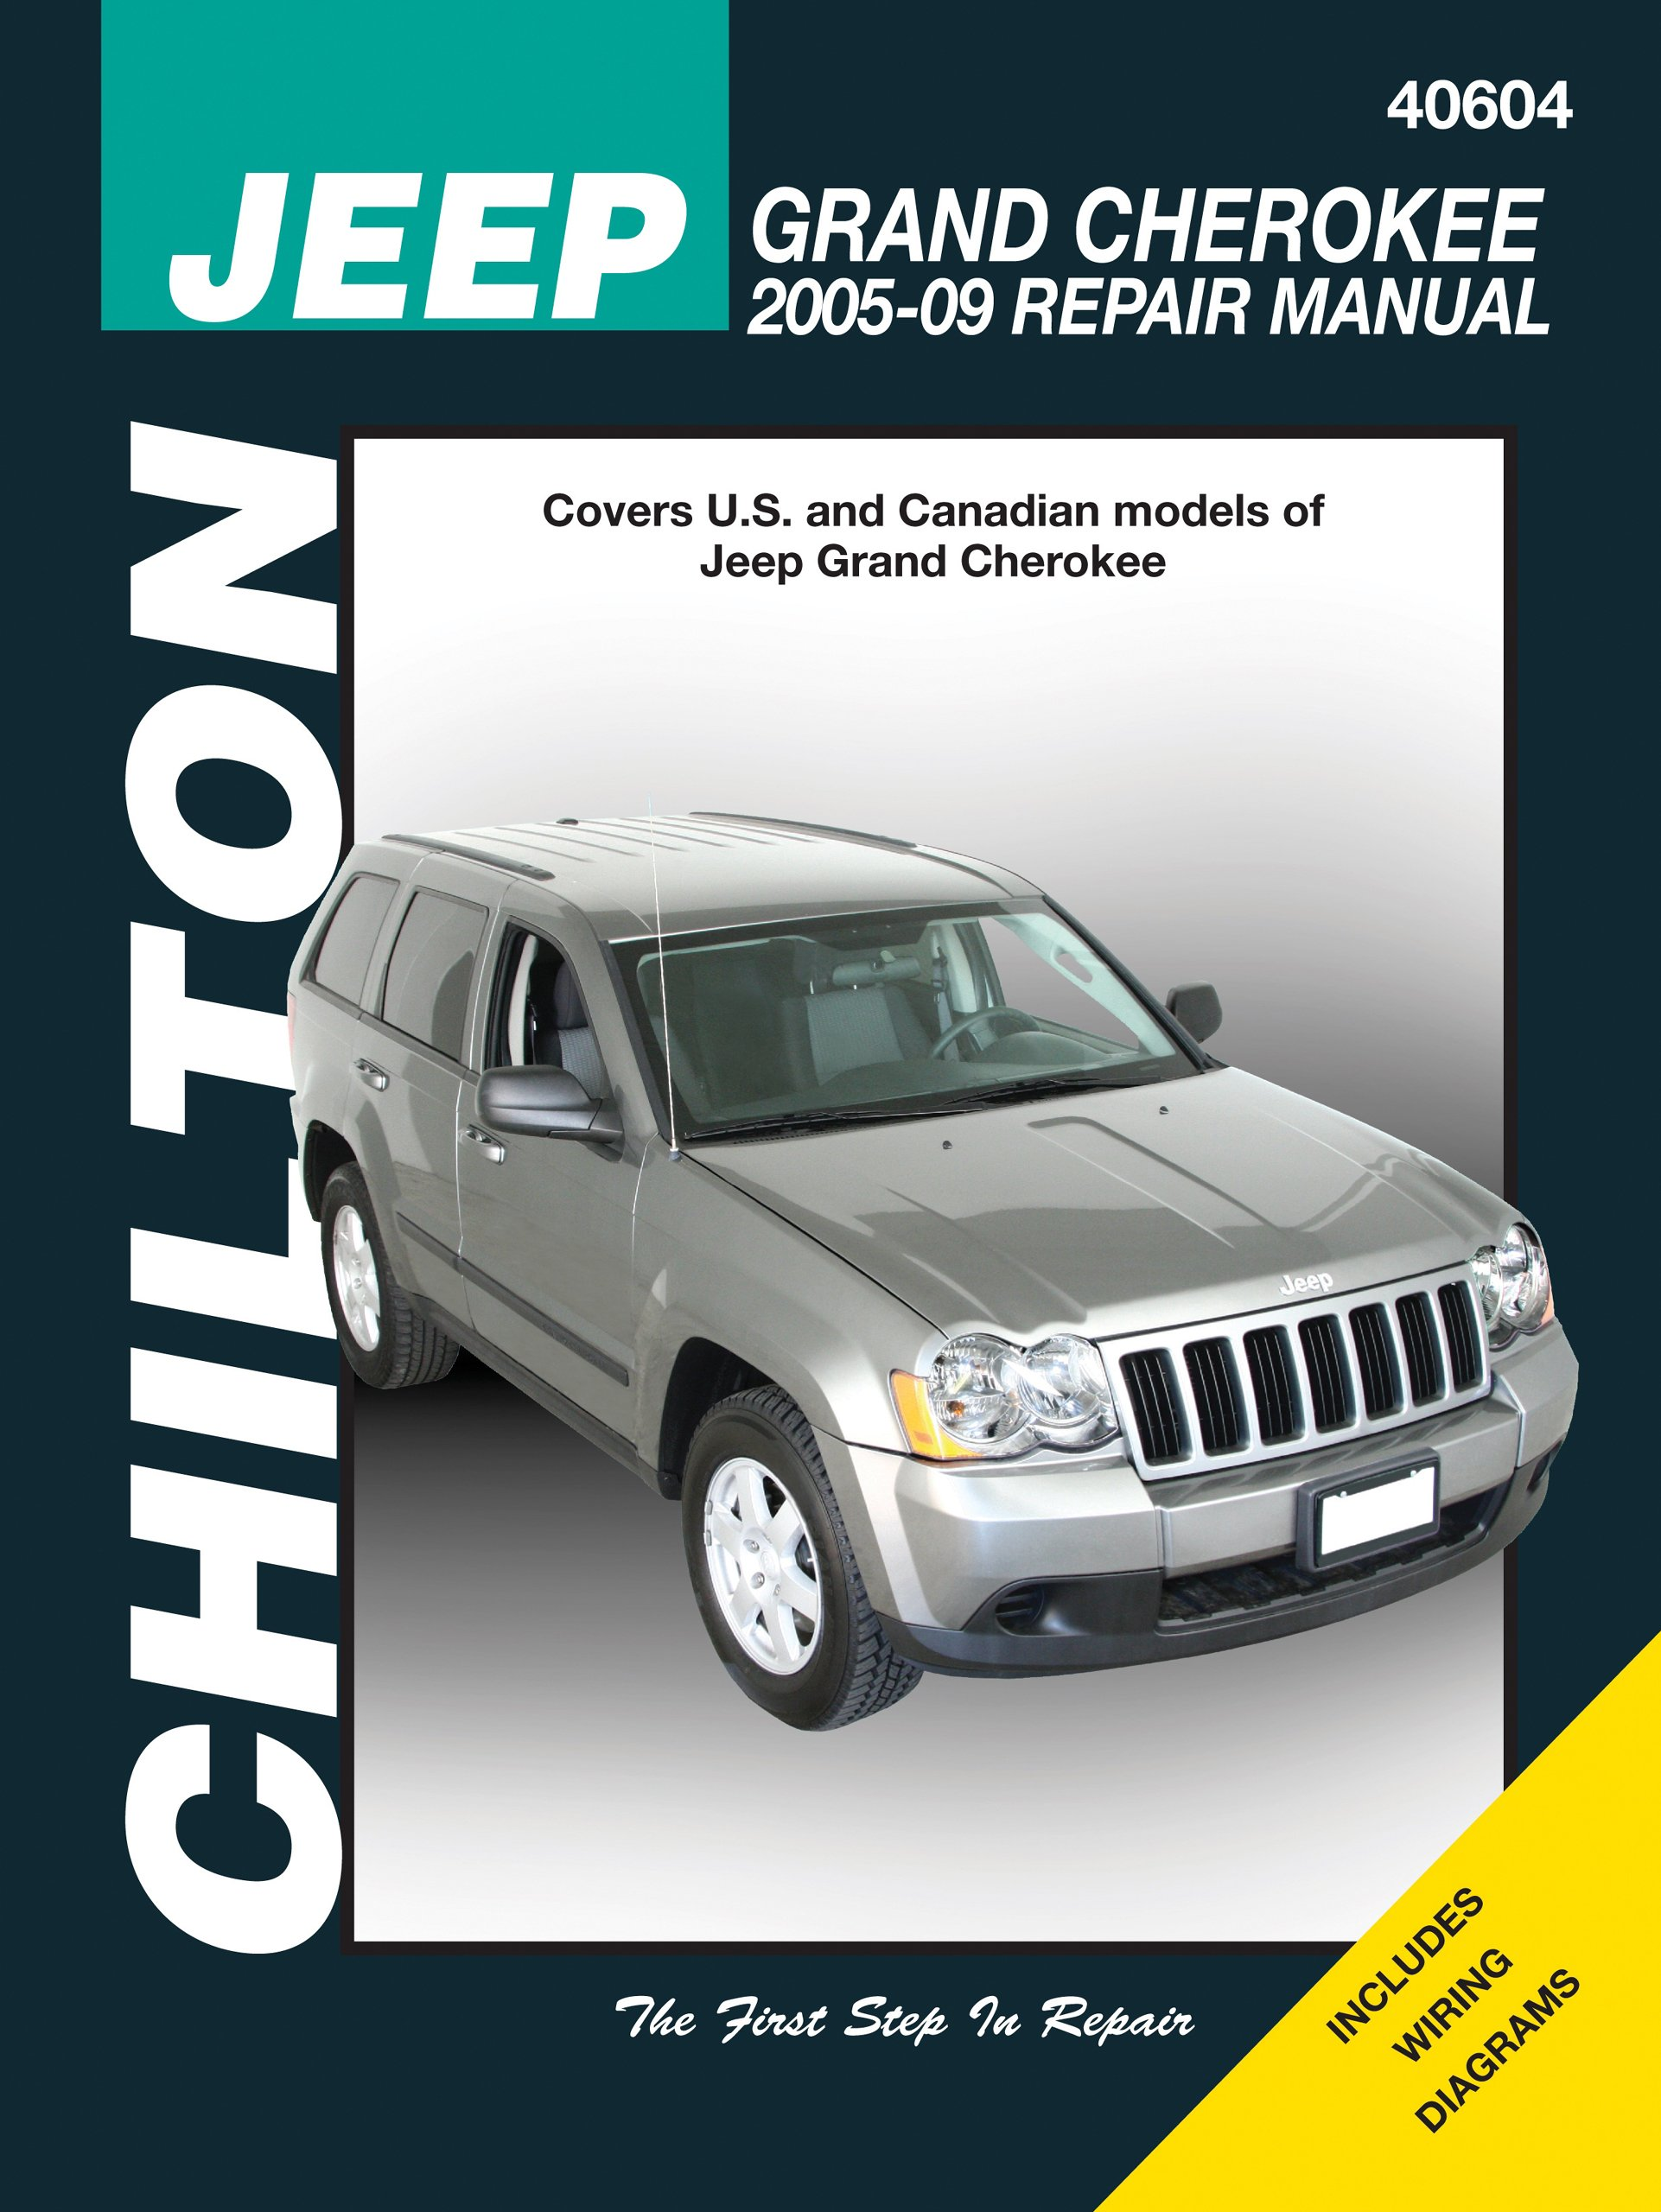 Jeep Grand Cherokee Automotive Repair Manual: 05-09 (Haynes Automotive Repair  Manuals): Amazon.co.uk: Ed McCahill, Jesus Chaidez: 9781563928345: Books